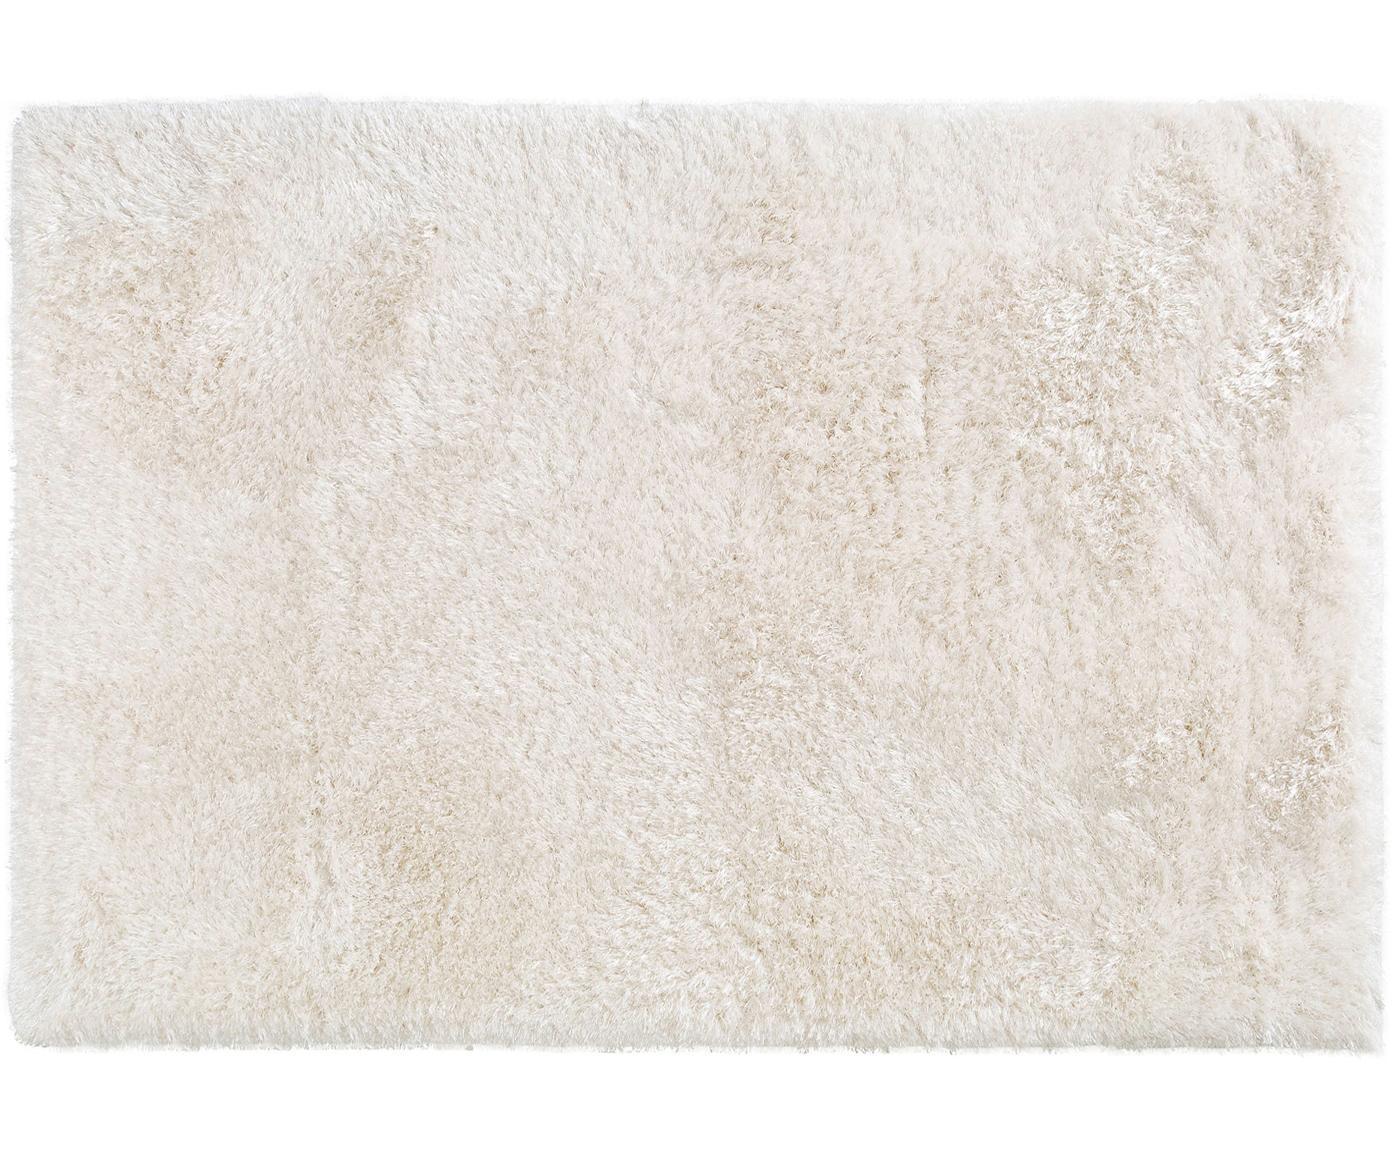 Glanzend hoogpolig vloerkleed Lea, 50% polyester, 50% polypropyleen, Wit, B 140 x L 200 cm (maat S)